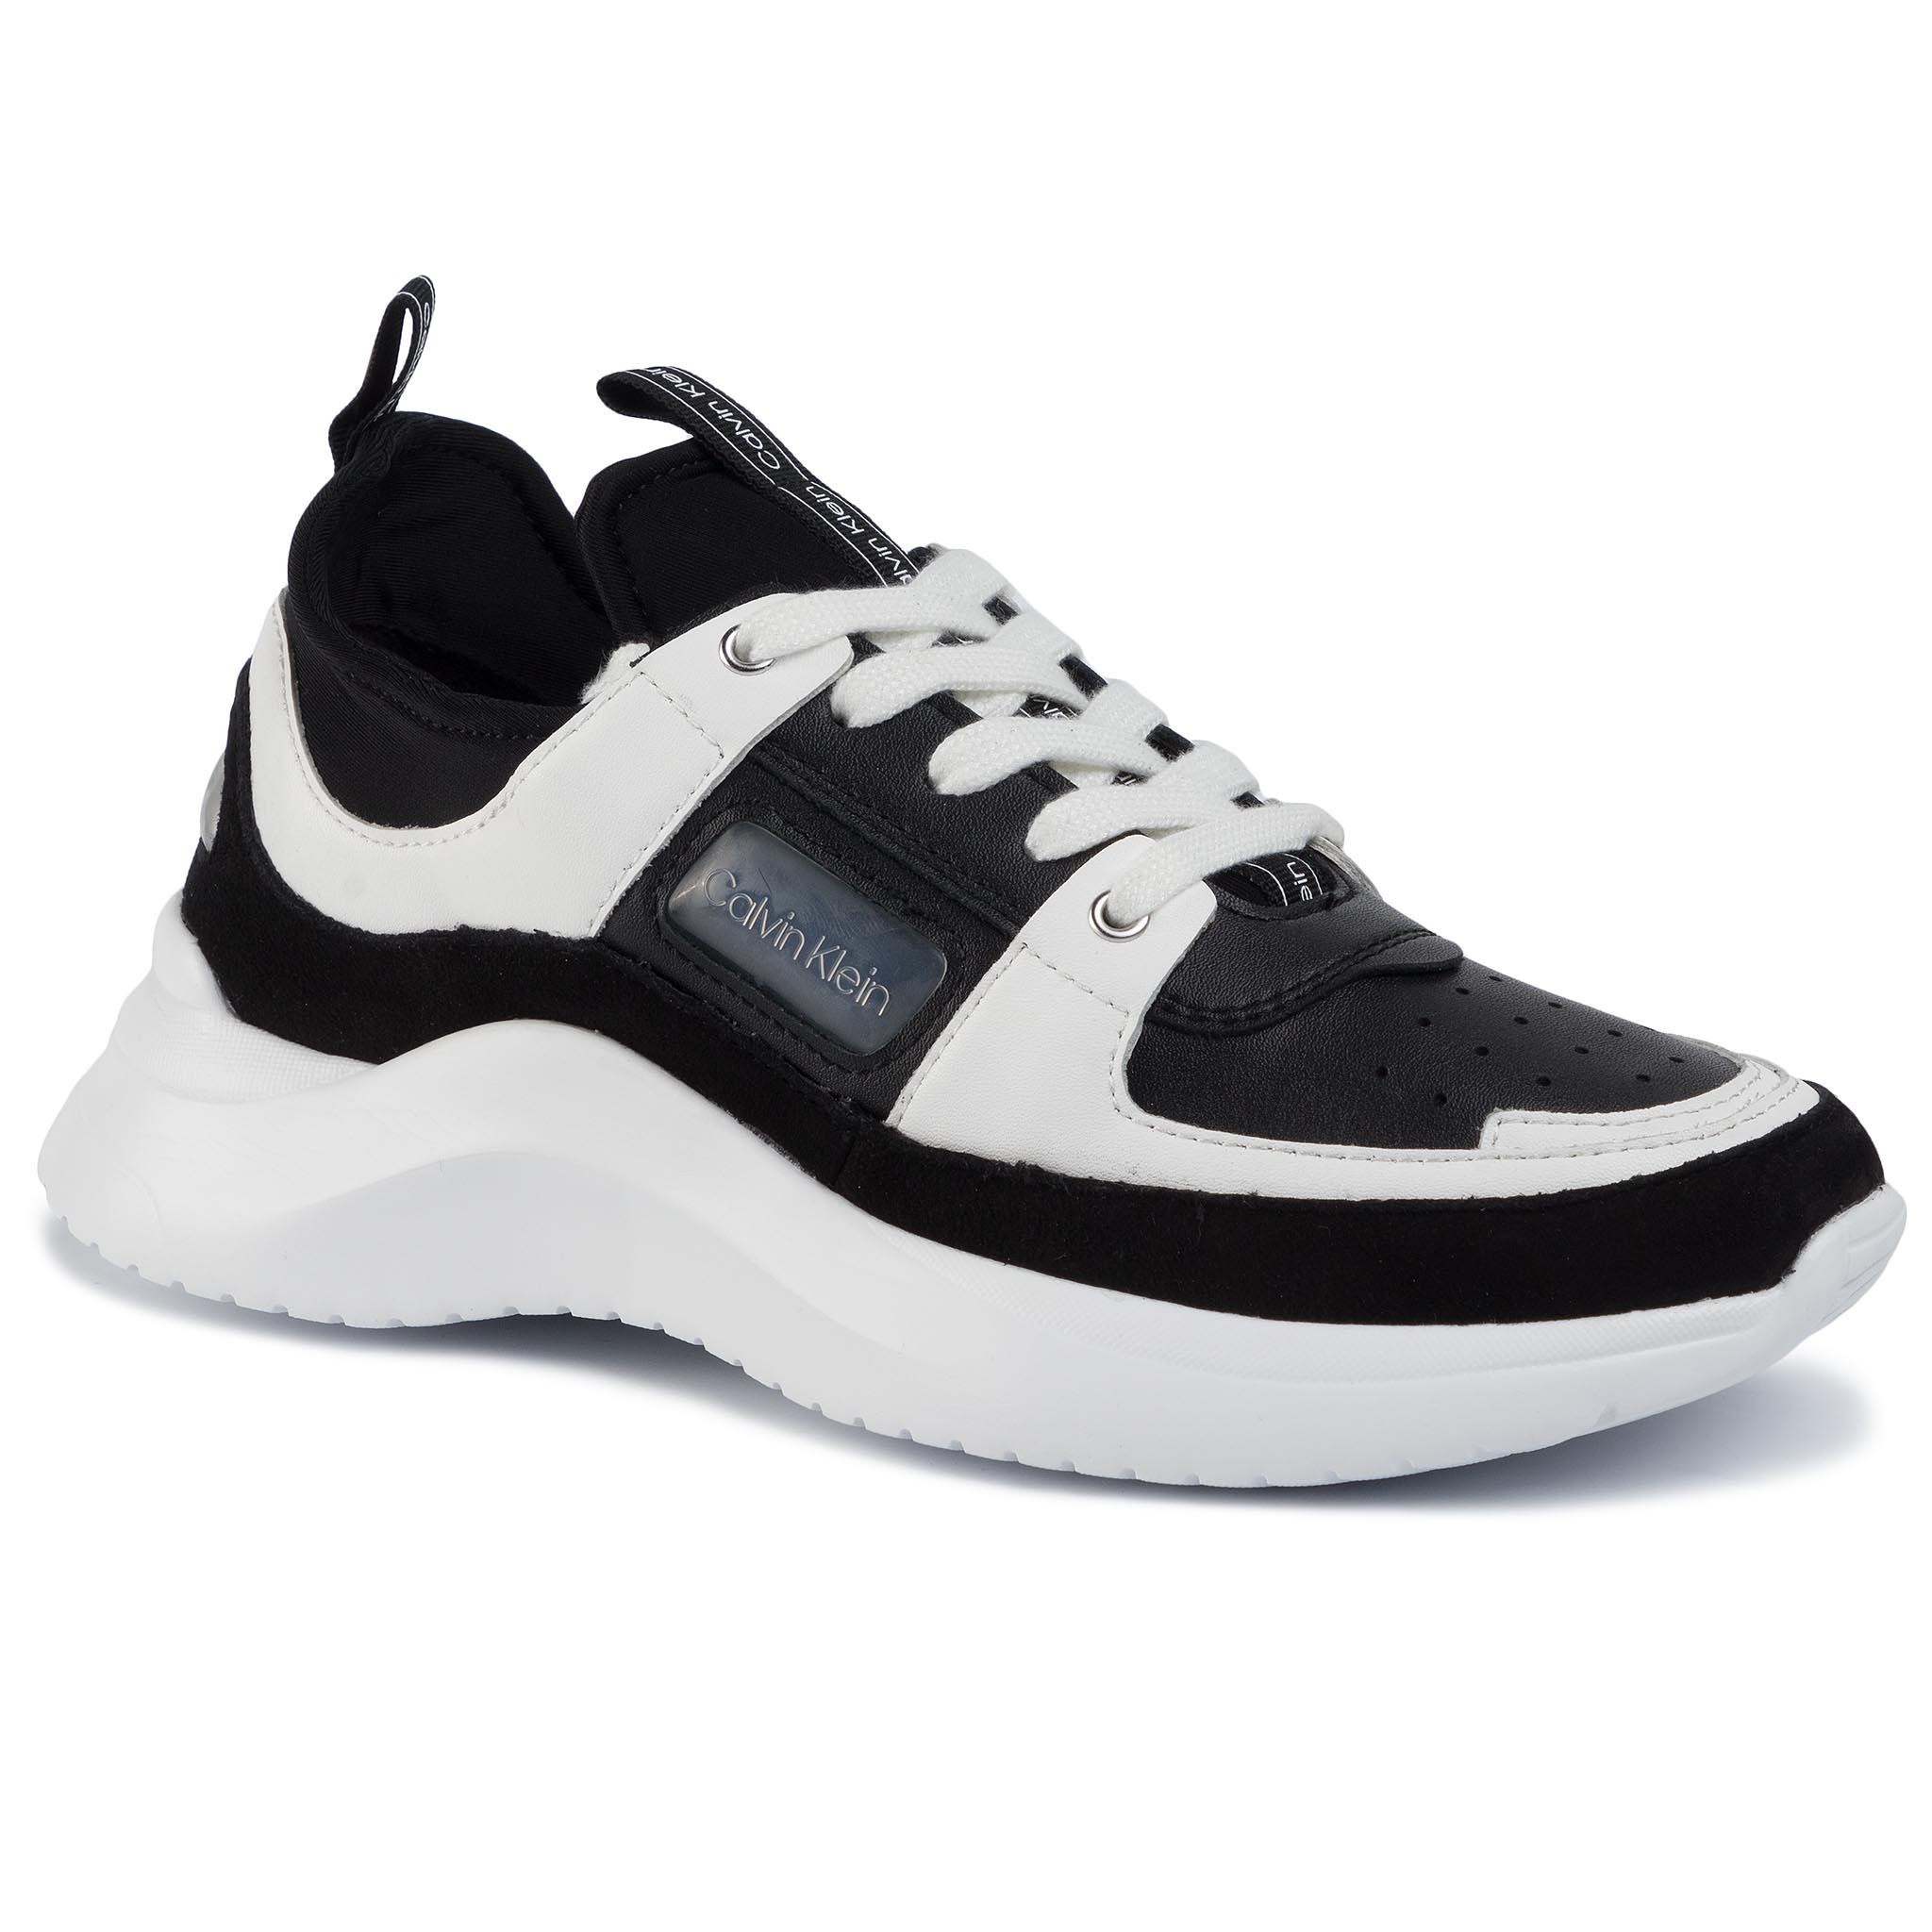 Sneakers CALVIN KLEIN - Ultra Low Top Lace Up Neop B4E4936 Black/White